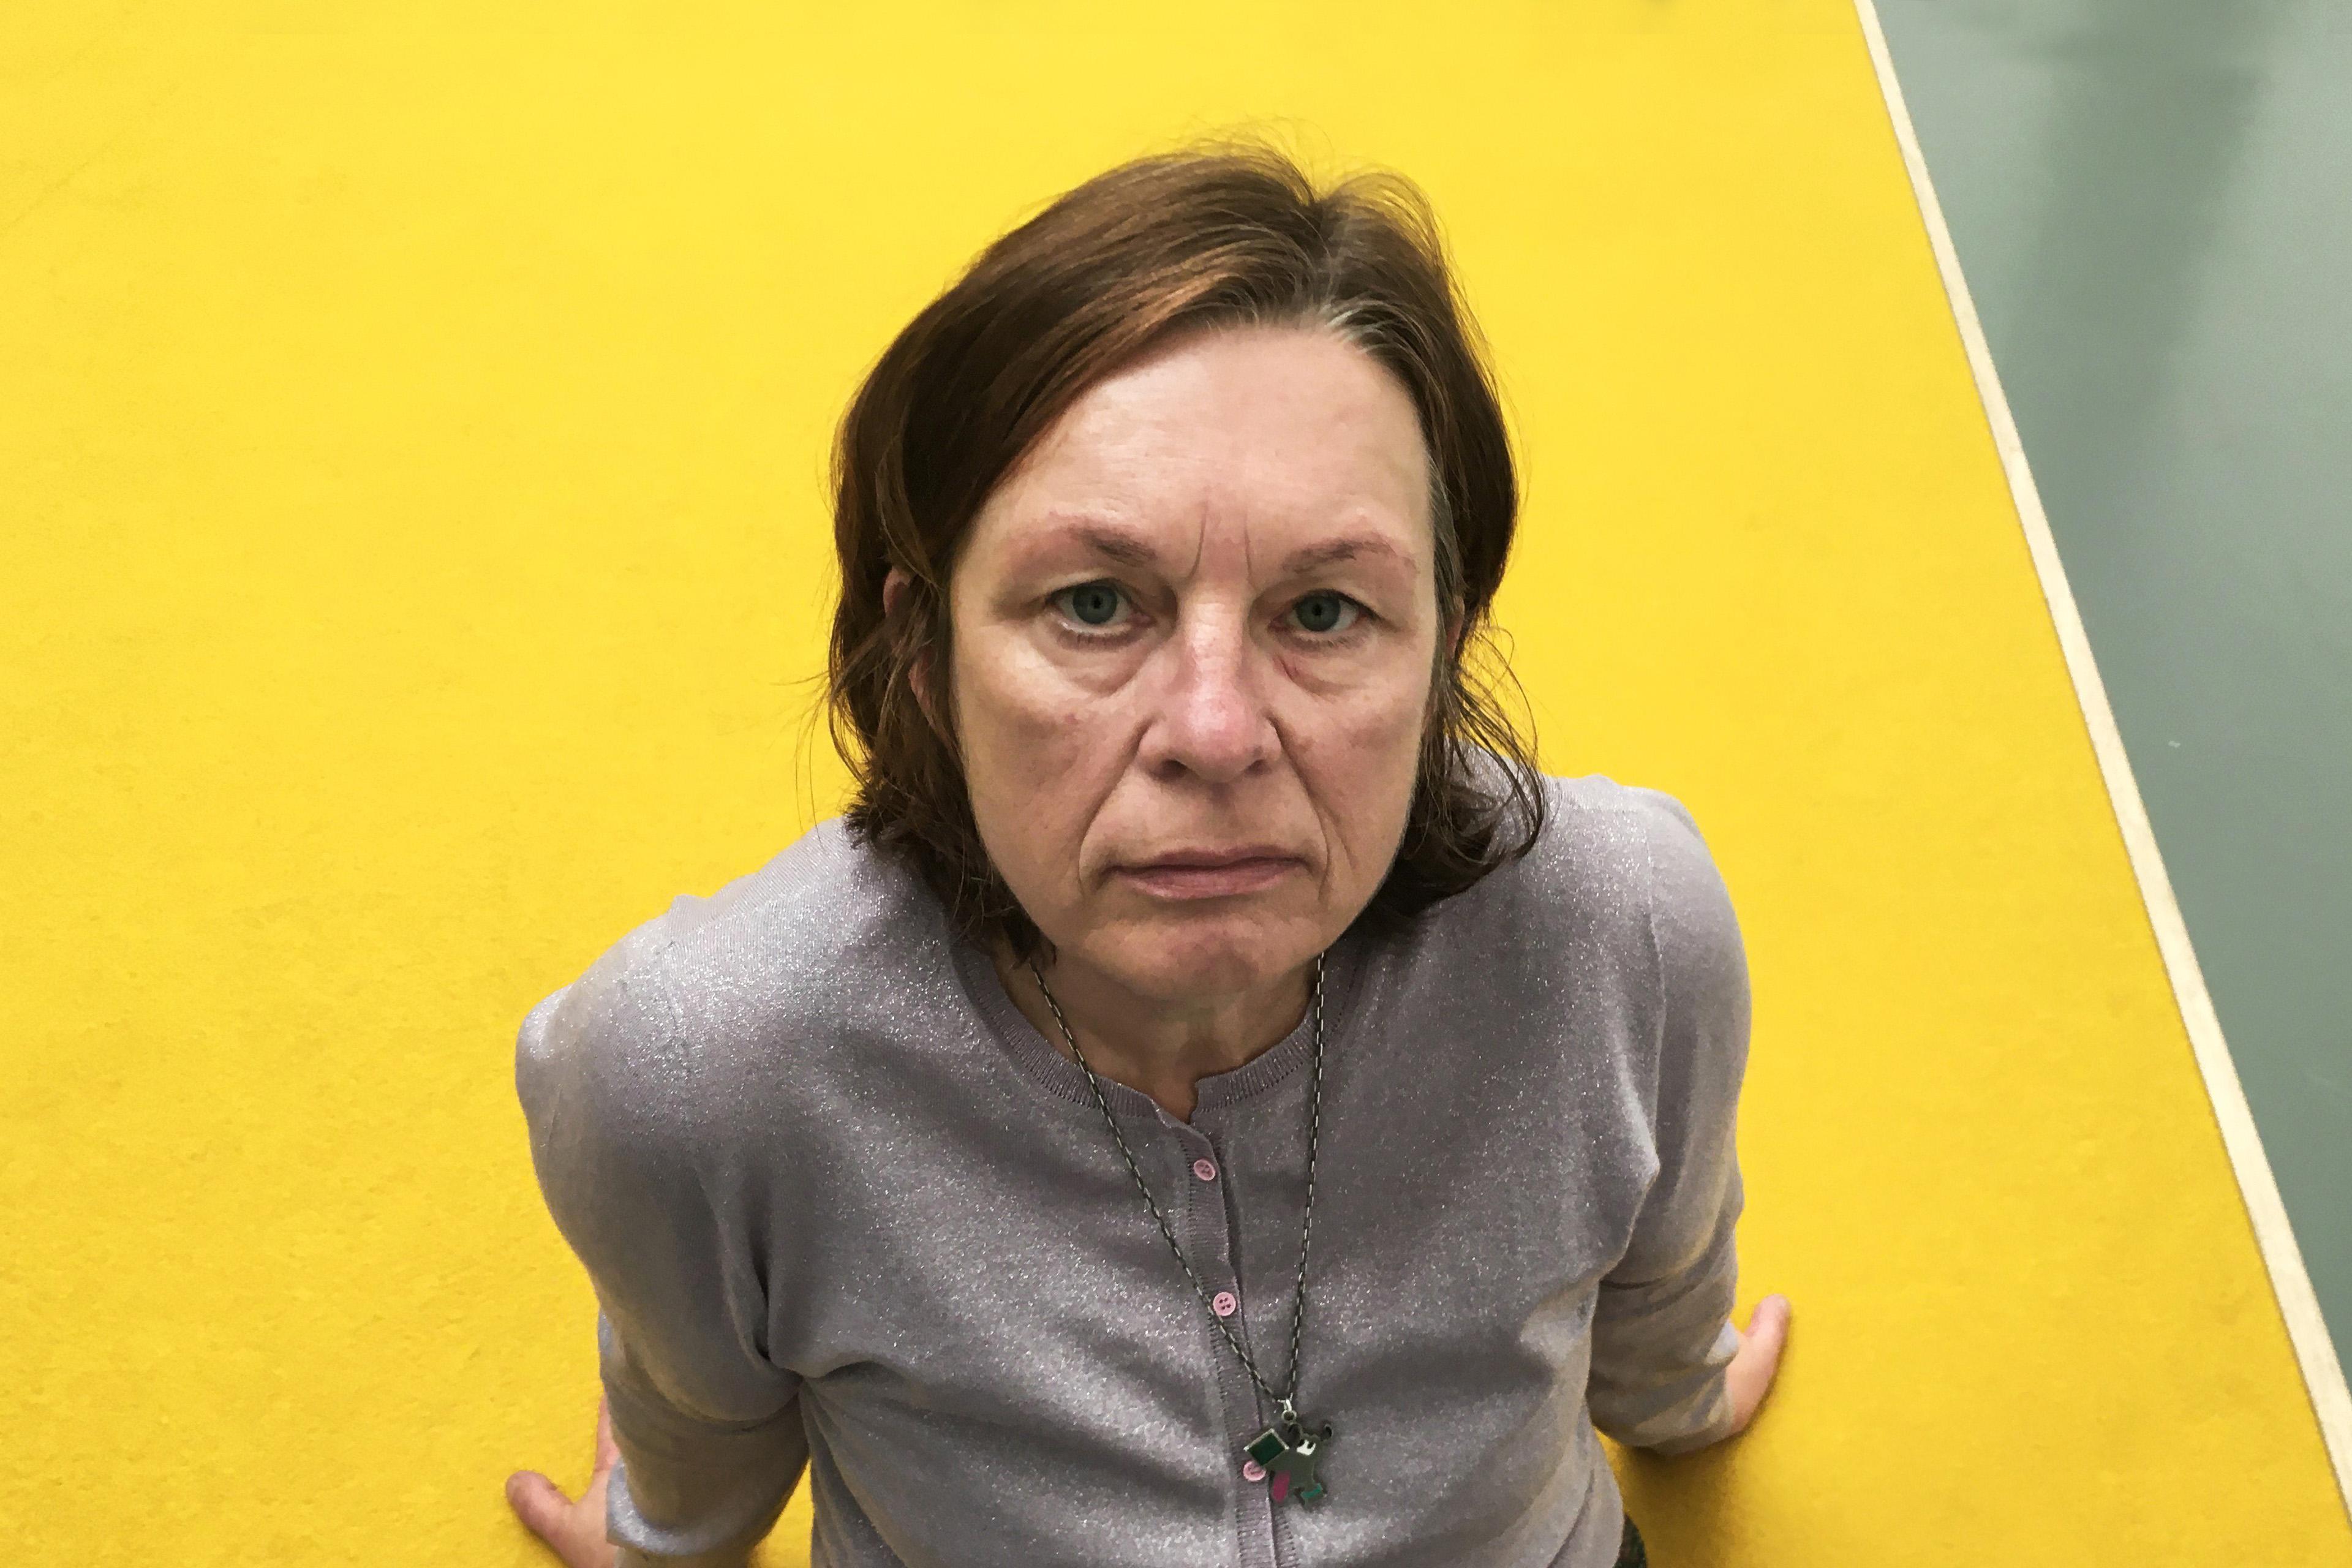 A portrait of Heidi Specker